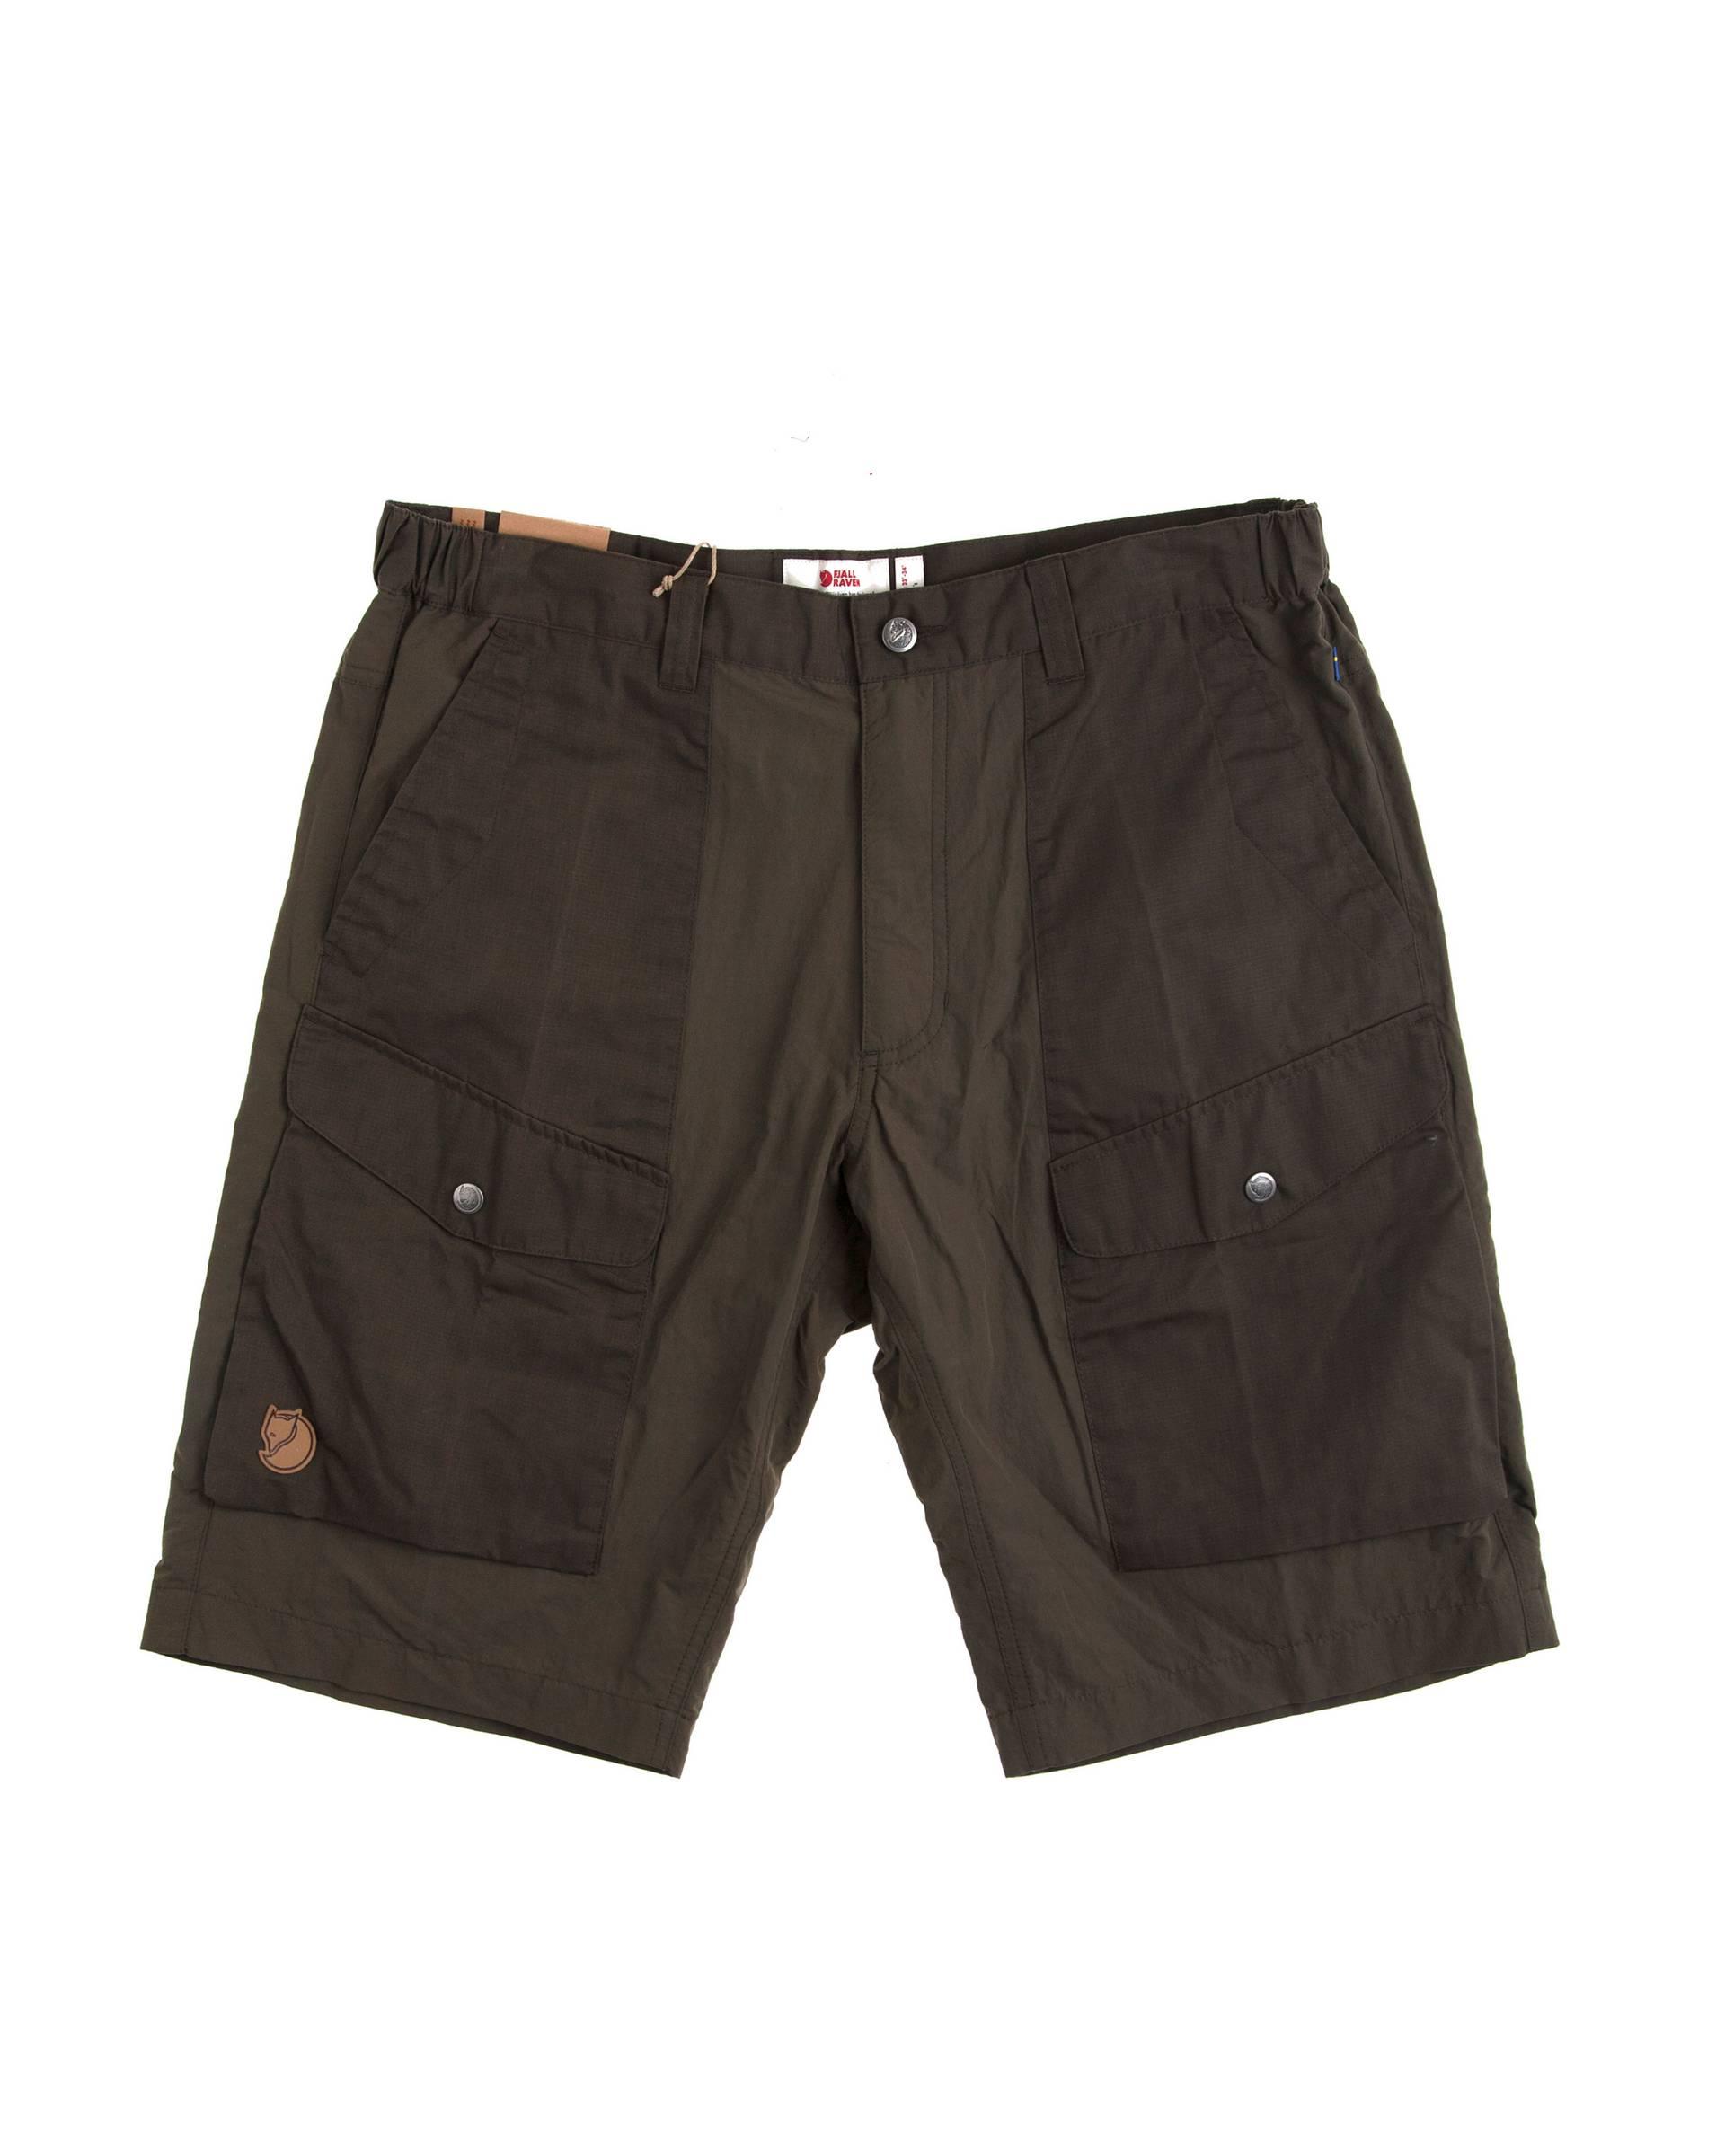 Шорты Fjallraven Abisco Hybrid Olive Shorts